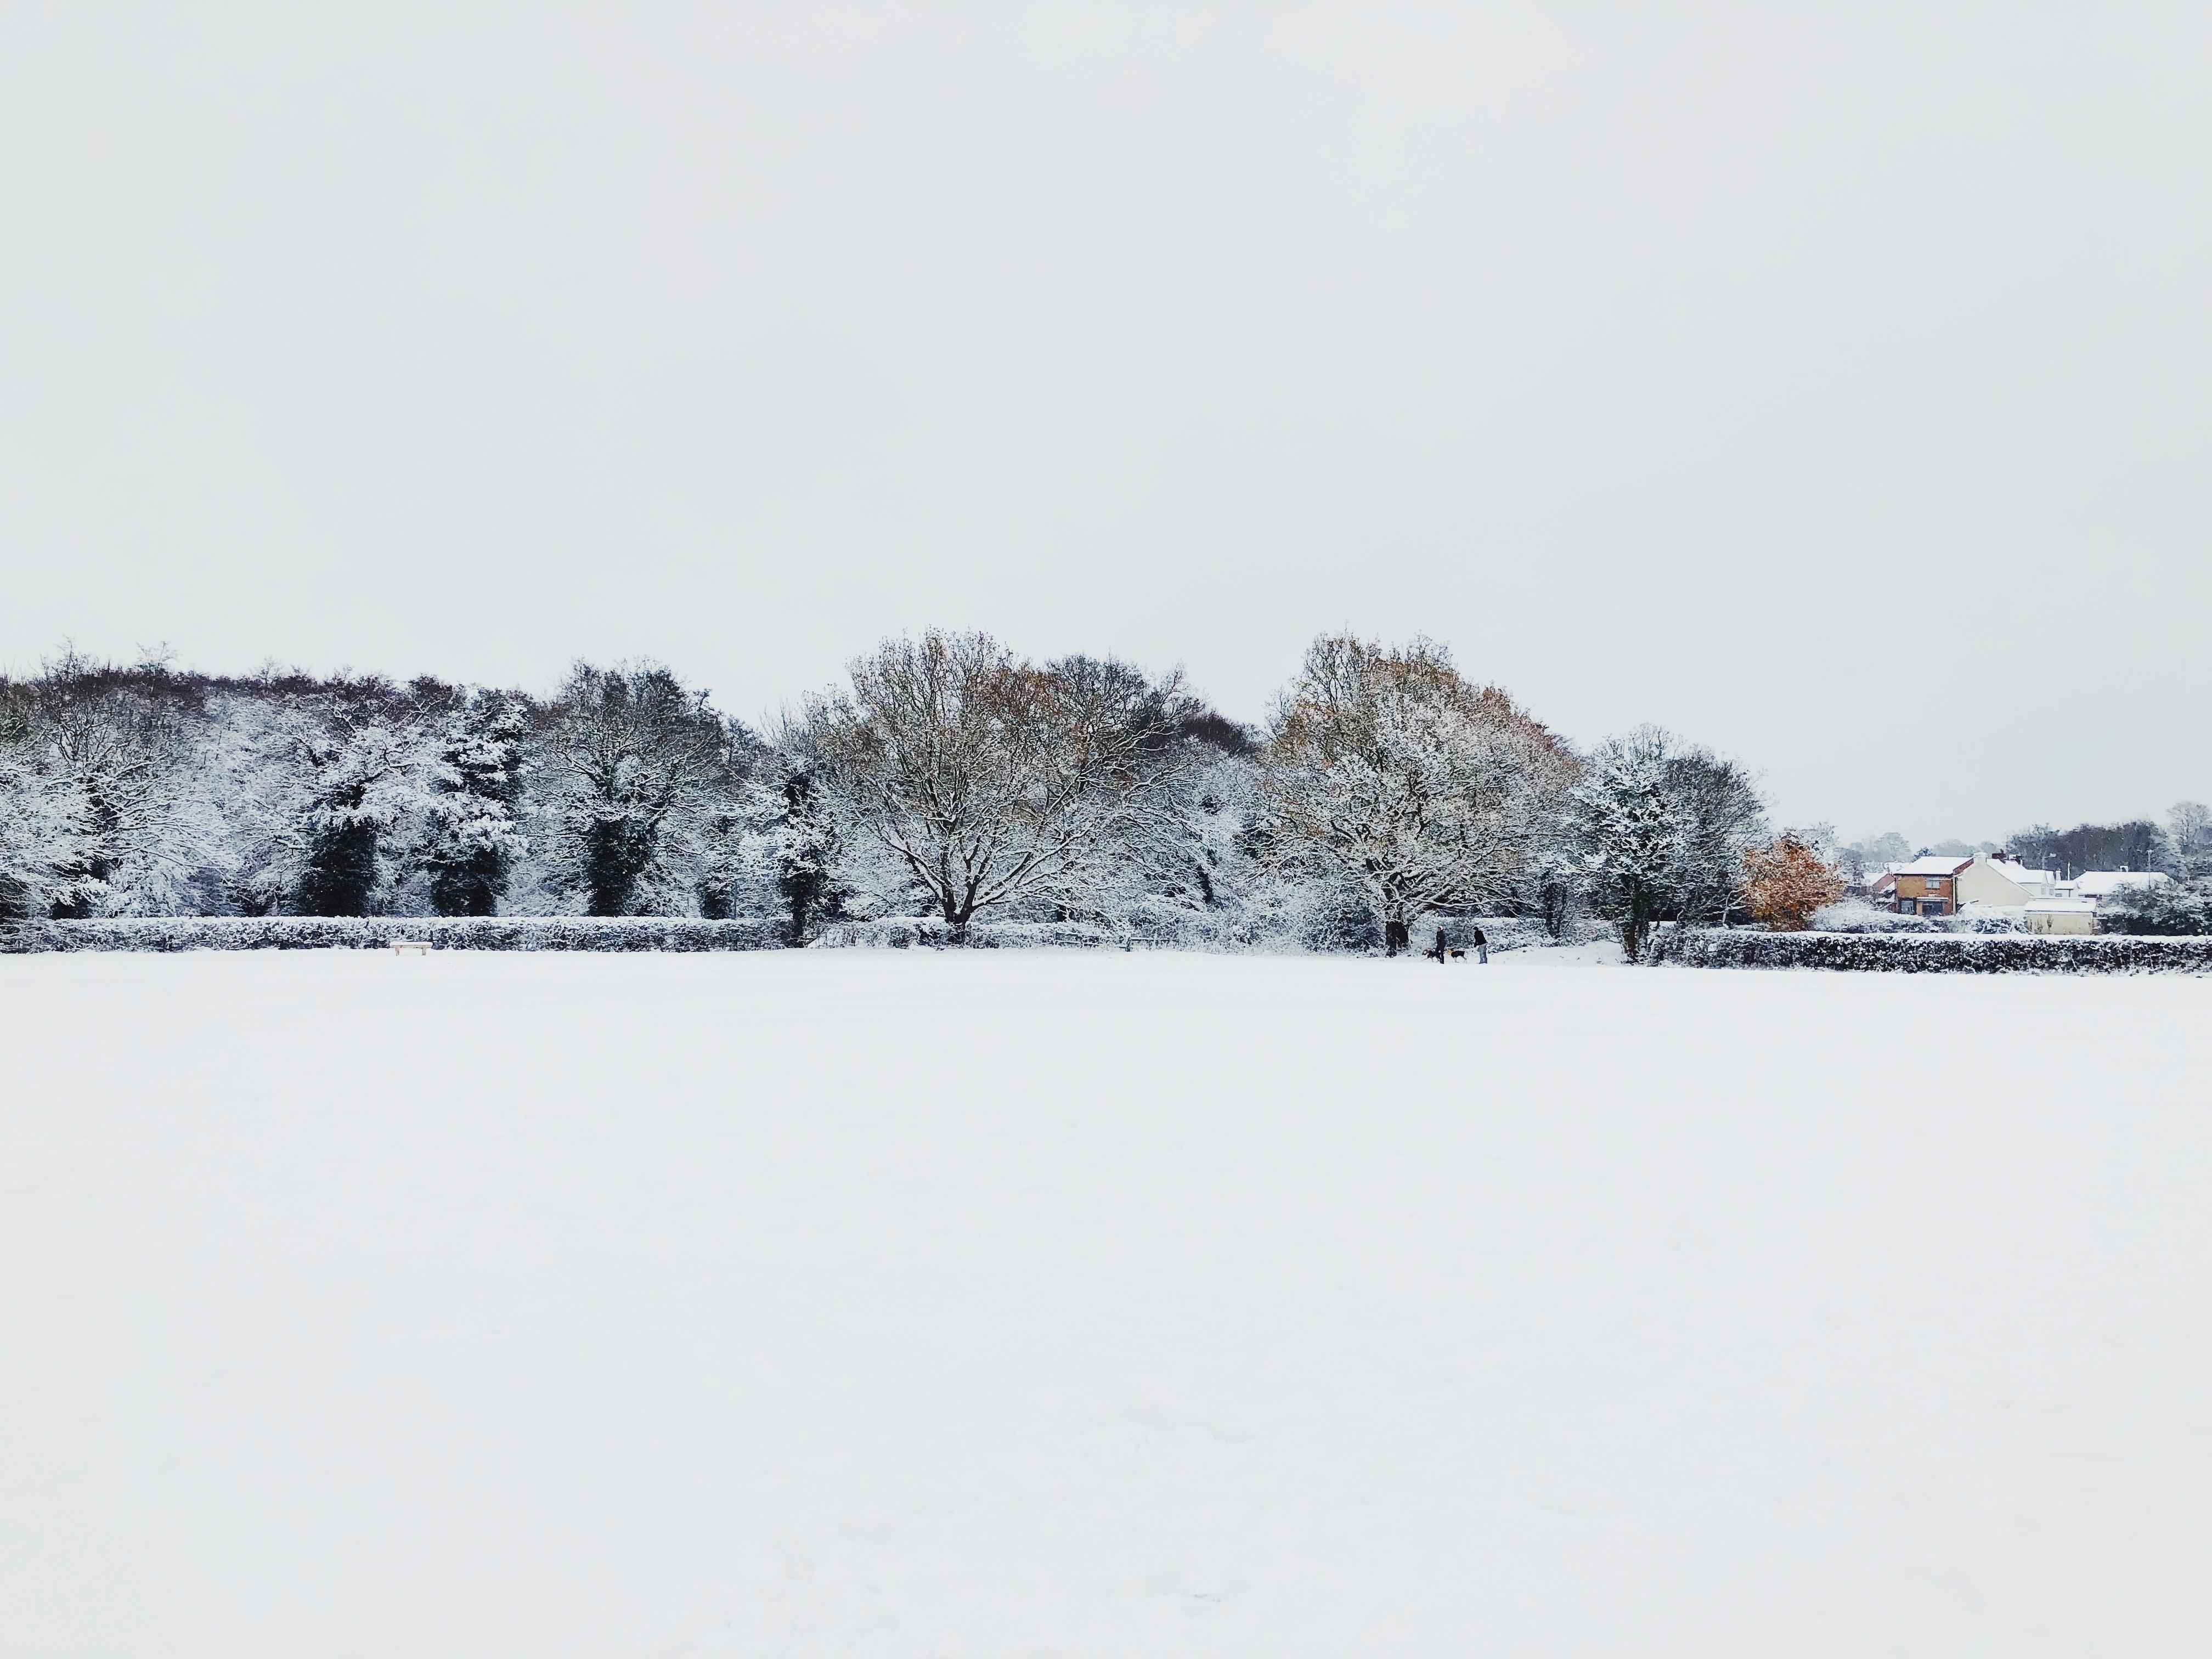 snow covered ground under white sky at daytime